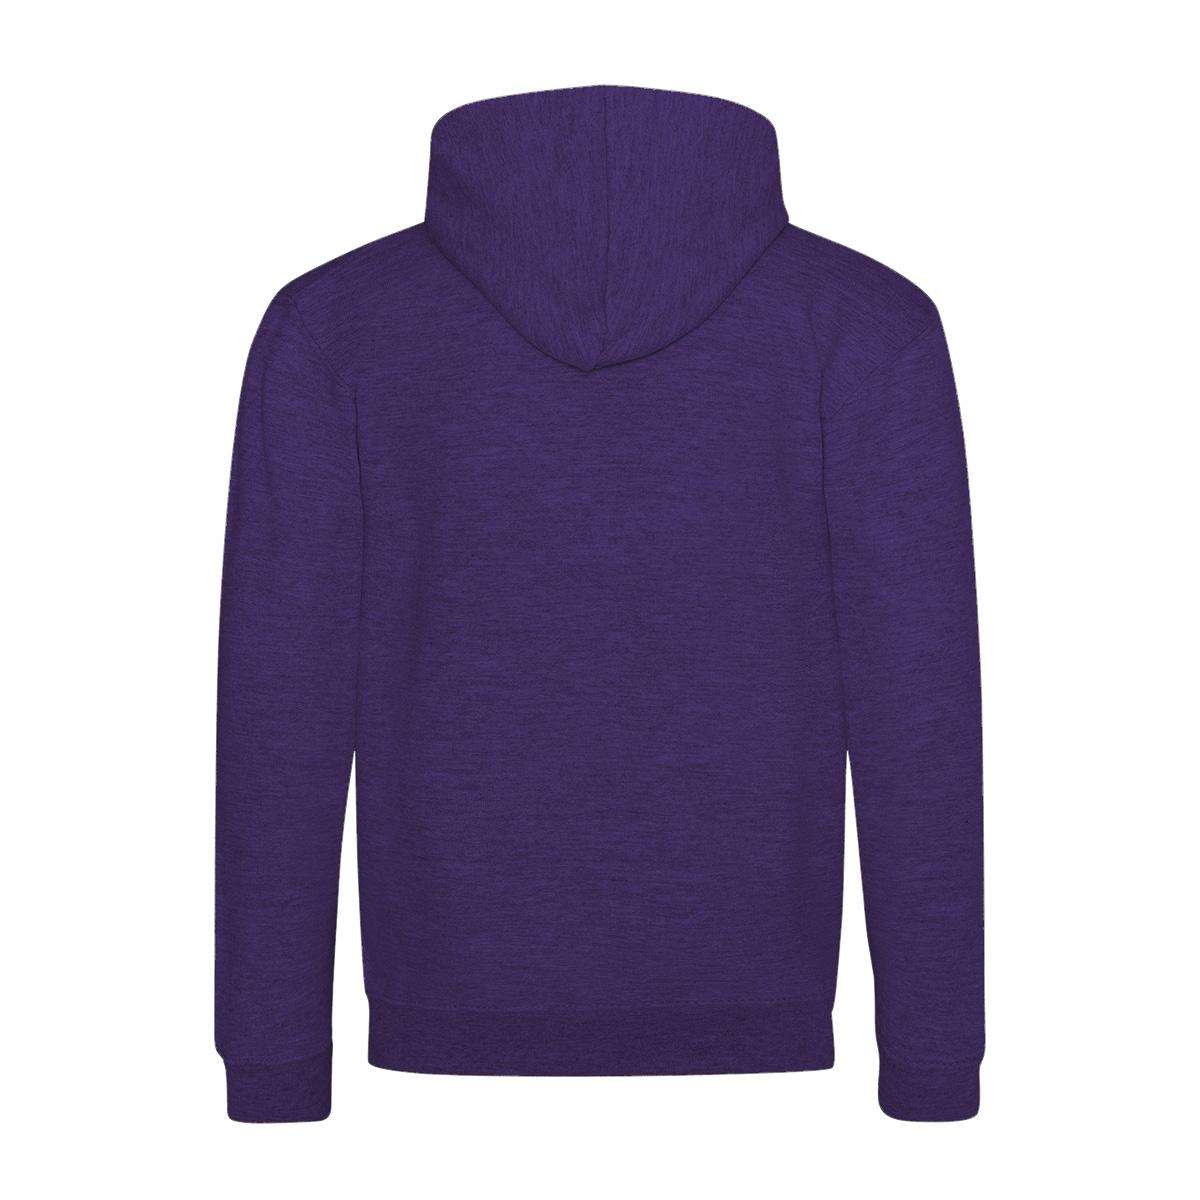 D05_jh53j_purple--0-0--ff507d49-ed4c-4962-823d-9c73f6dd075c